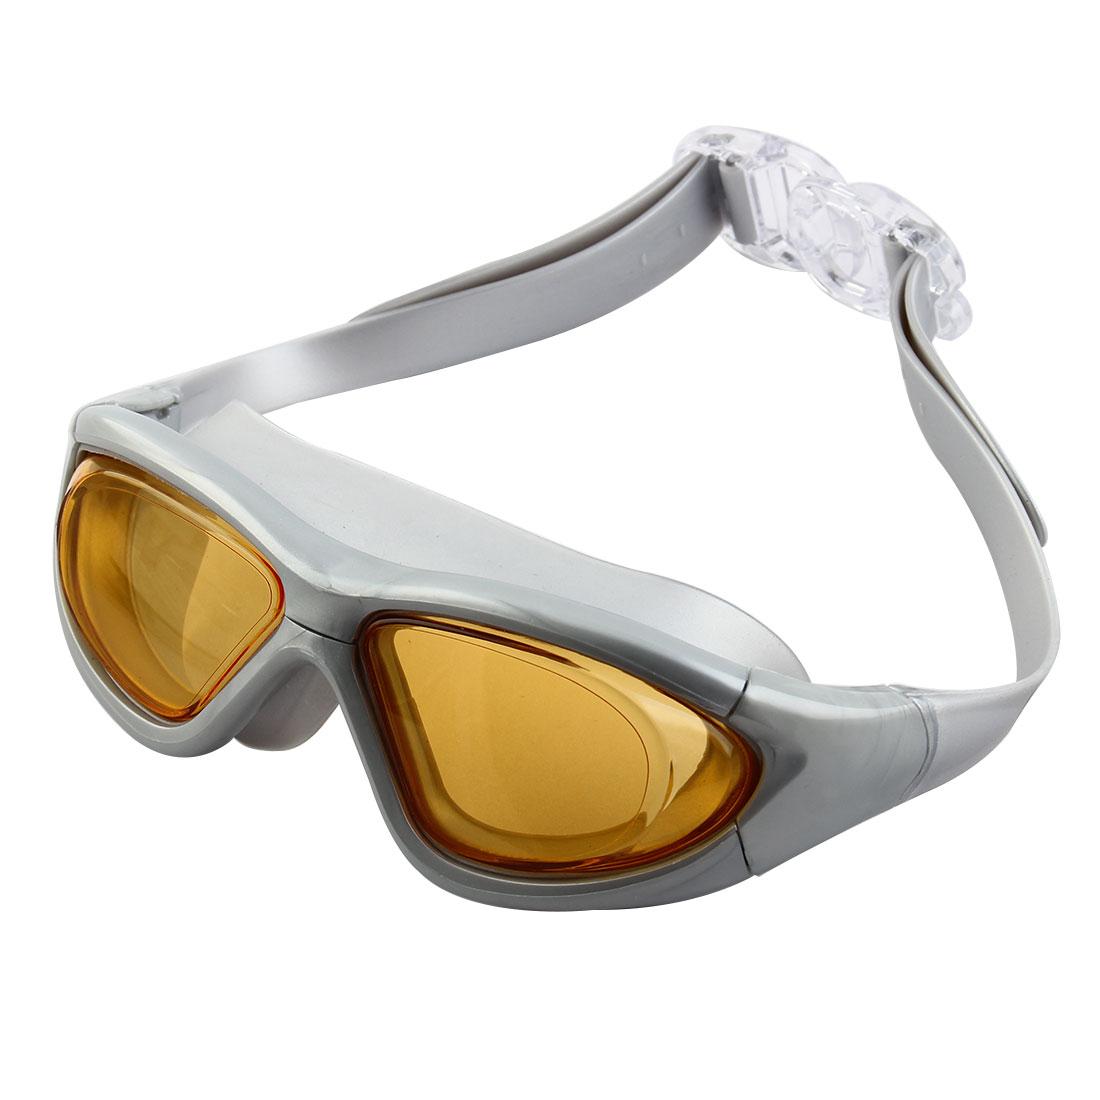 Clear Wide Vision Anti Fog Adjustable Belt Swim Glasses Swimming Goggles Orange w Storage Case for Adult Men Women